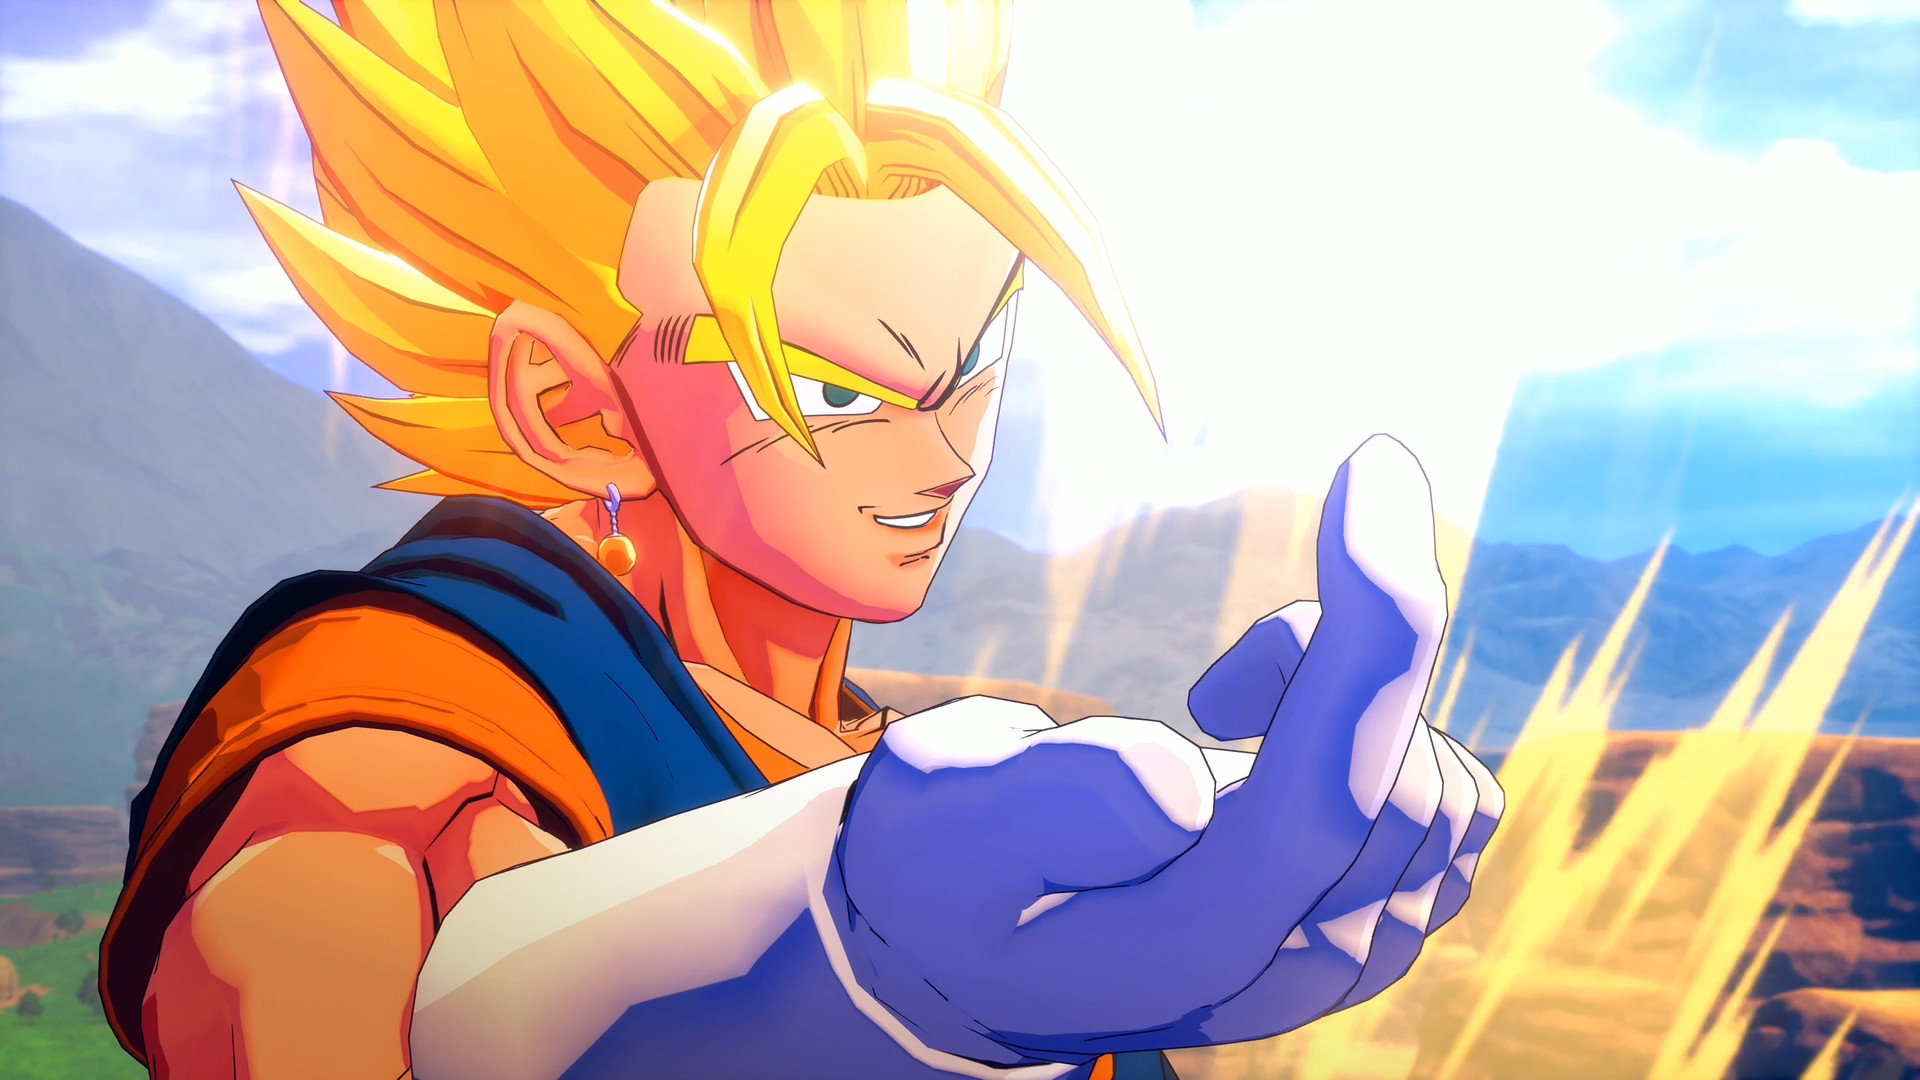 Цифровой тираж Dragon Ball Z: Kakarot за январь превысил 1,6 млн копий